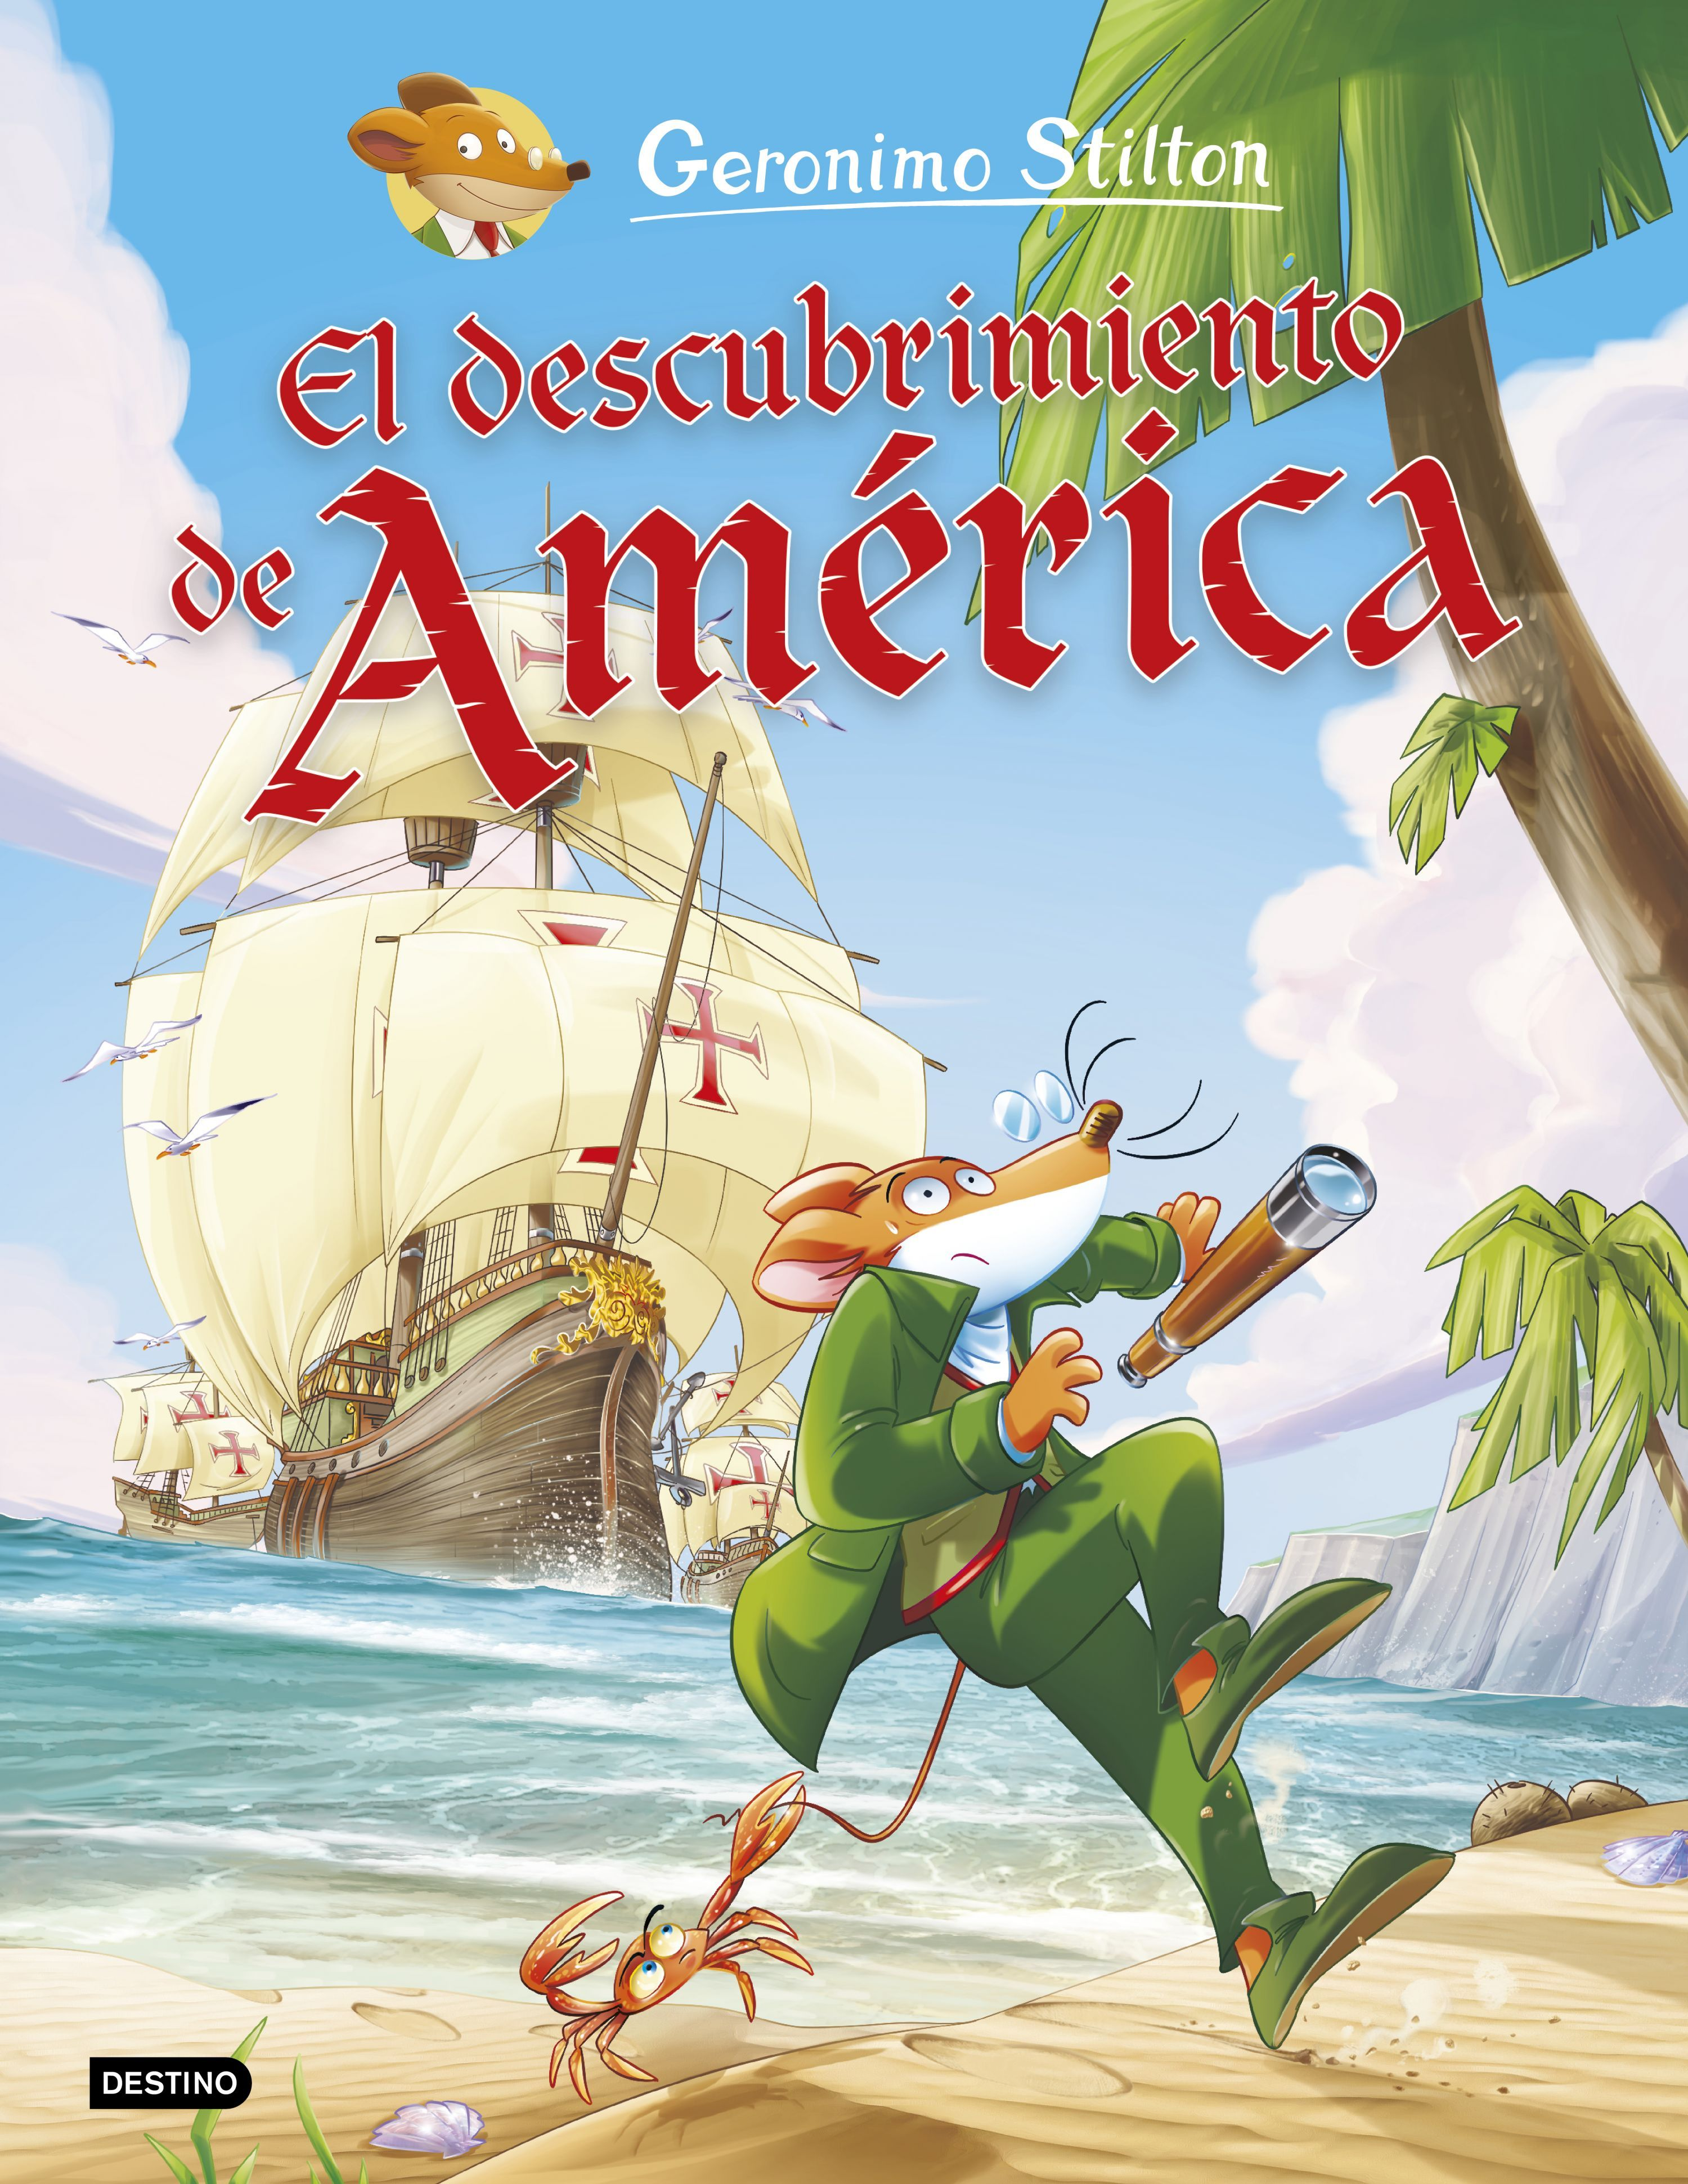 GERONIMO STILTON ELDESCUBRIMIENTO DE AMÉRICA